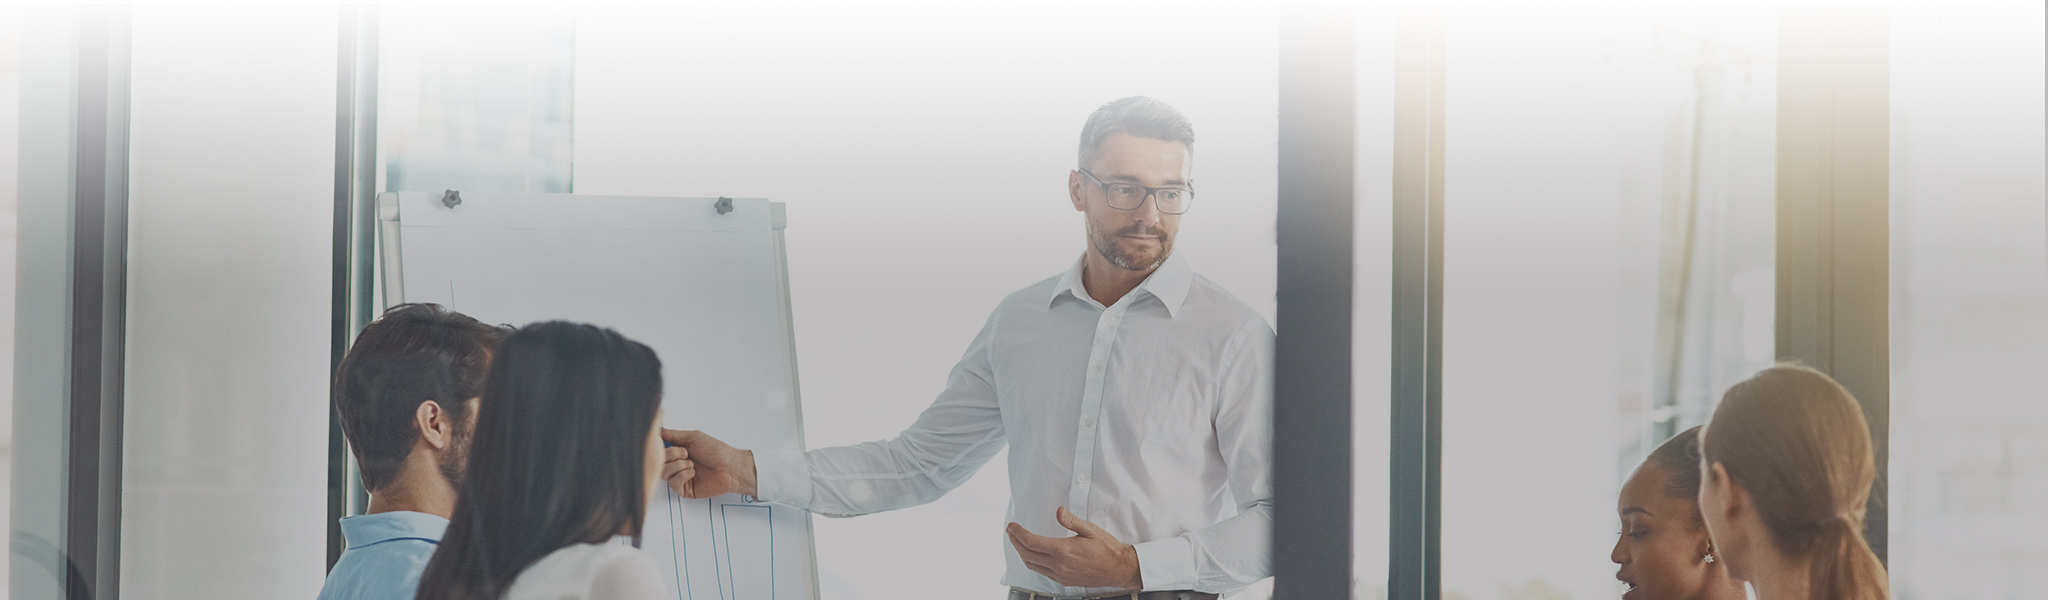 Inside Sales Training Ideas - Sell Like Hell Sales System